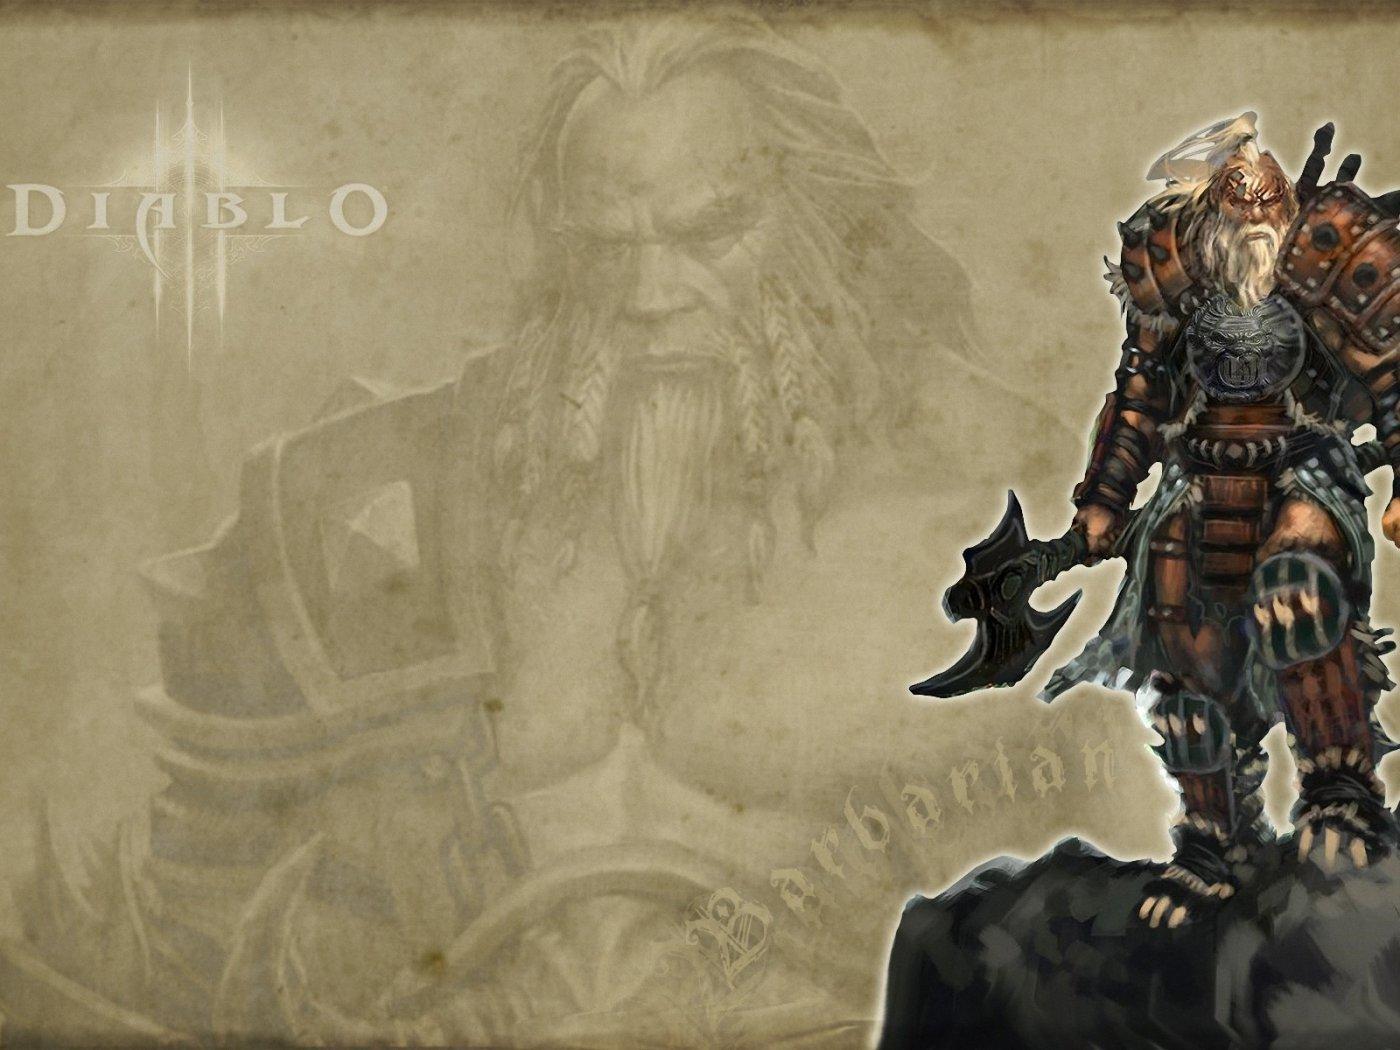 Diablo 3 Barbarian Trailer Revealed Gaming Duty 1400x1050